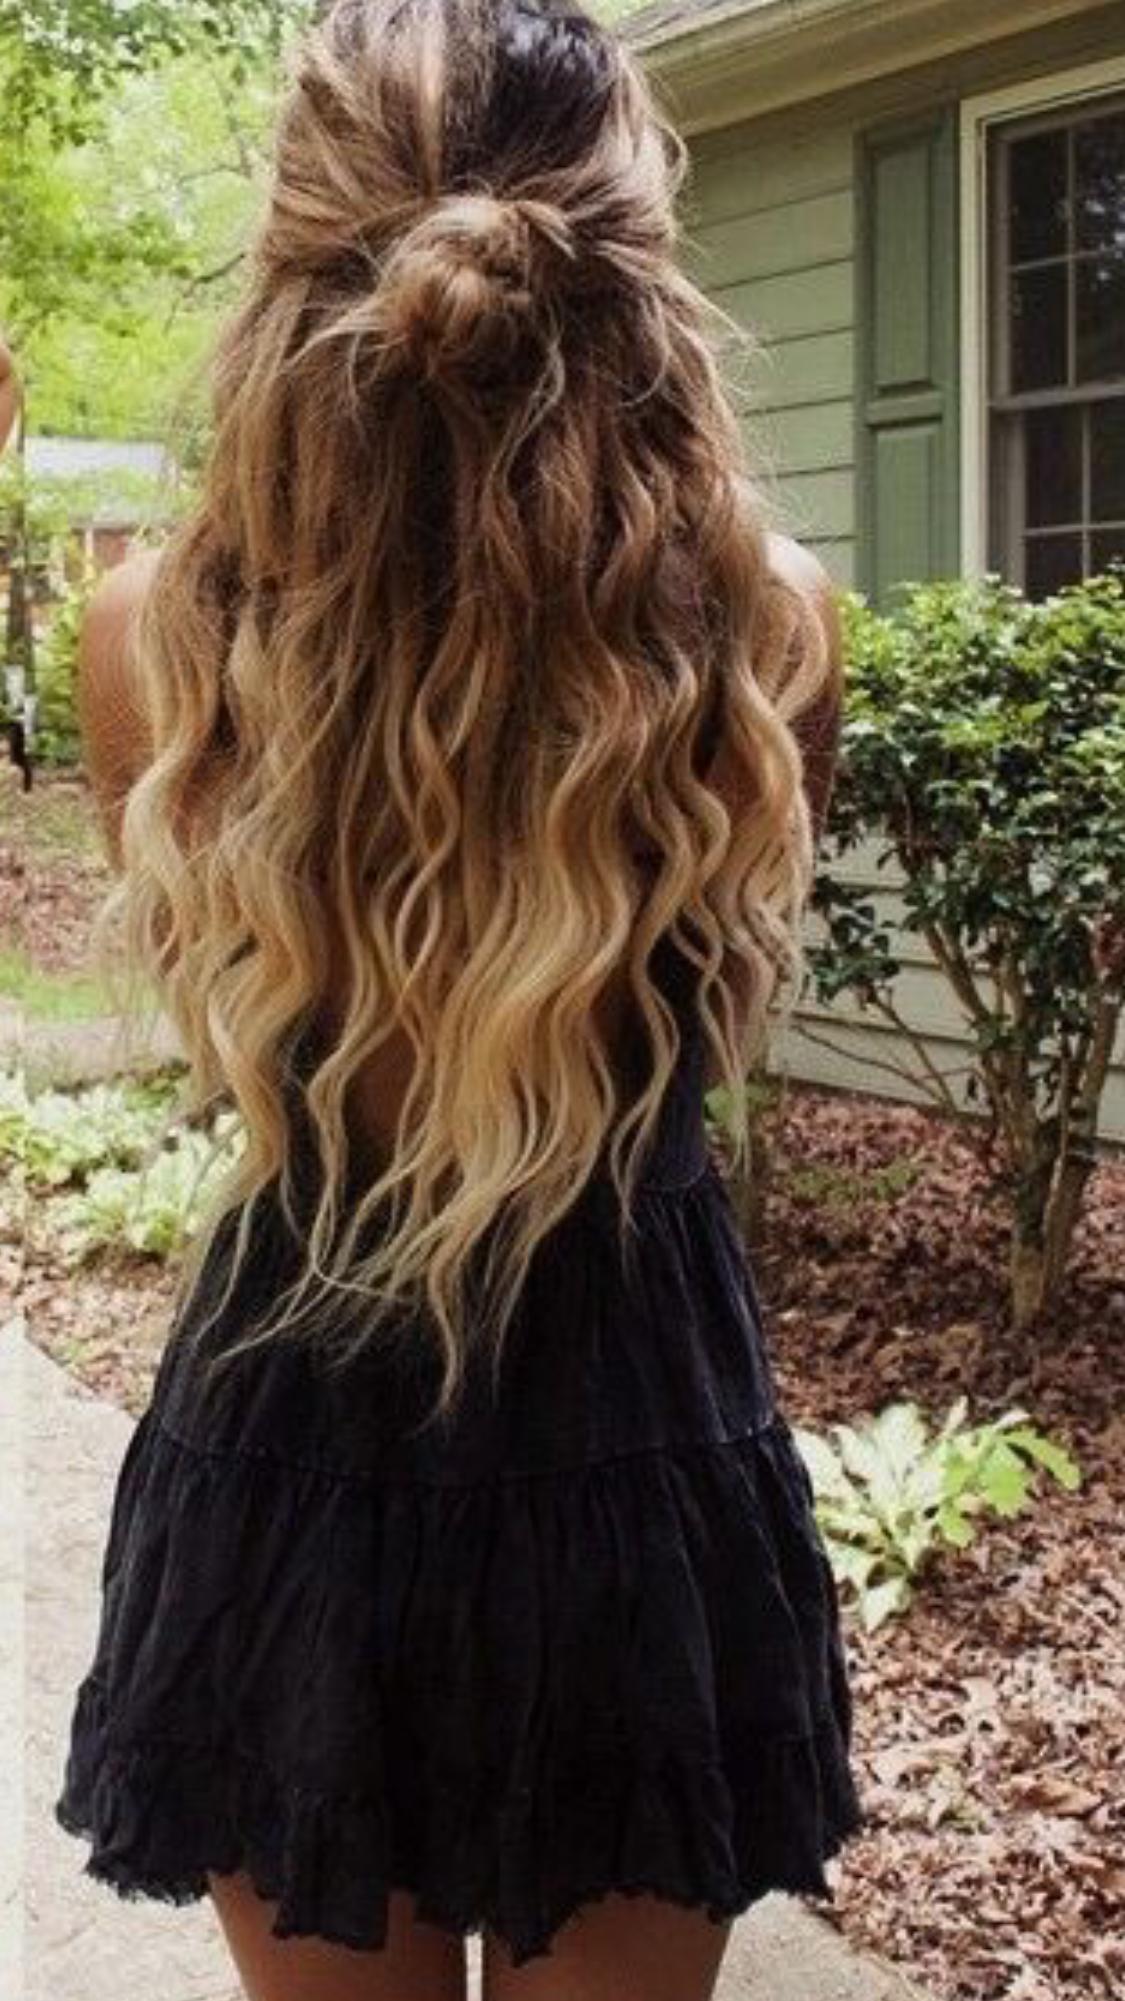 Caught the eye! | Long hair styles, Hair styles, Curly ...